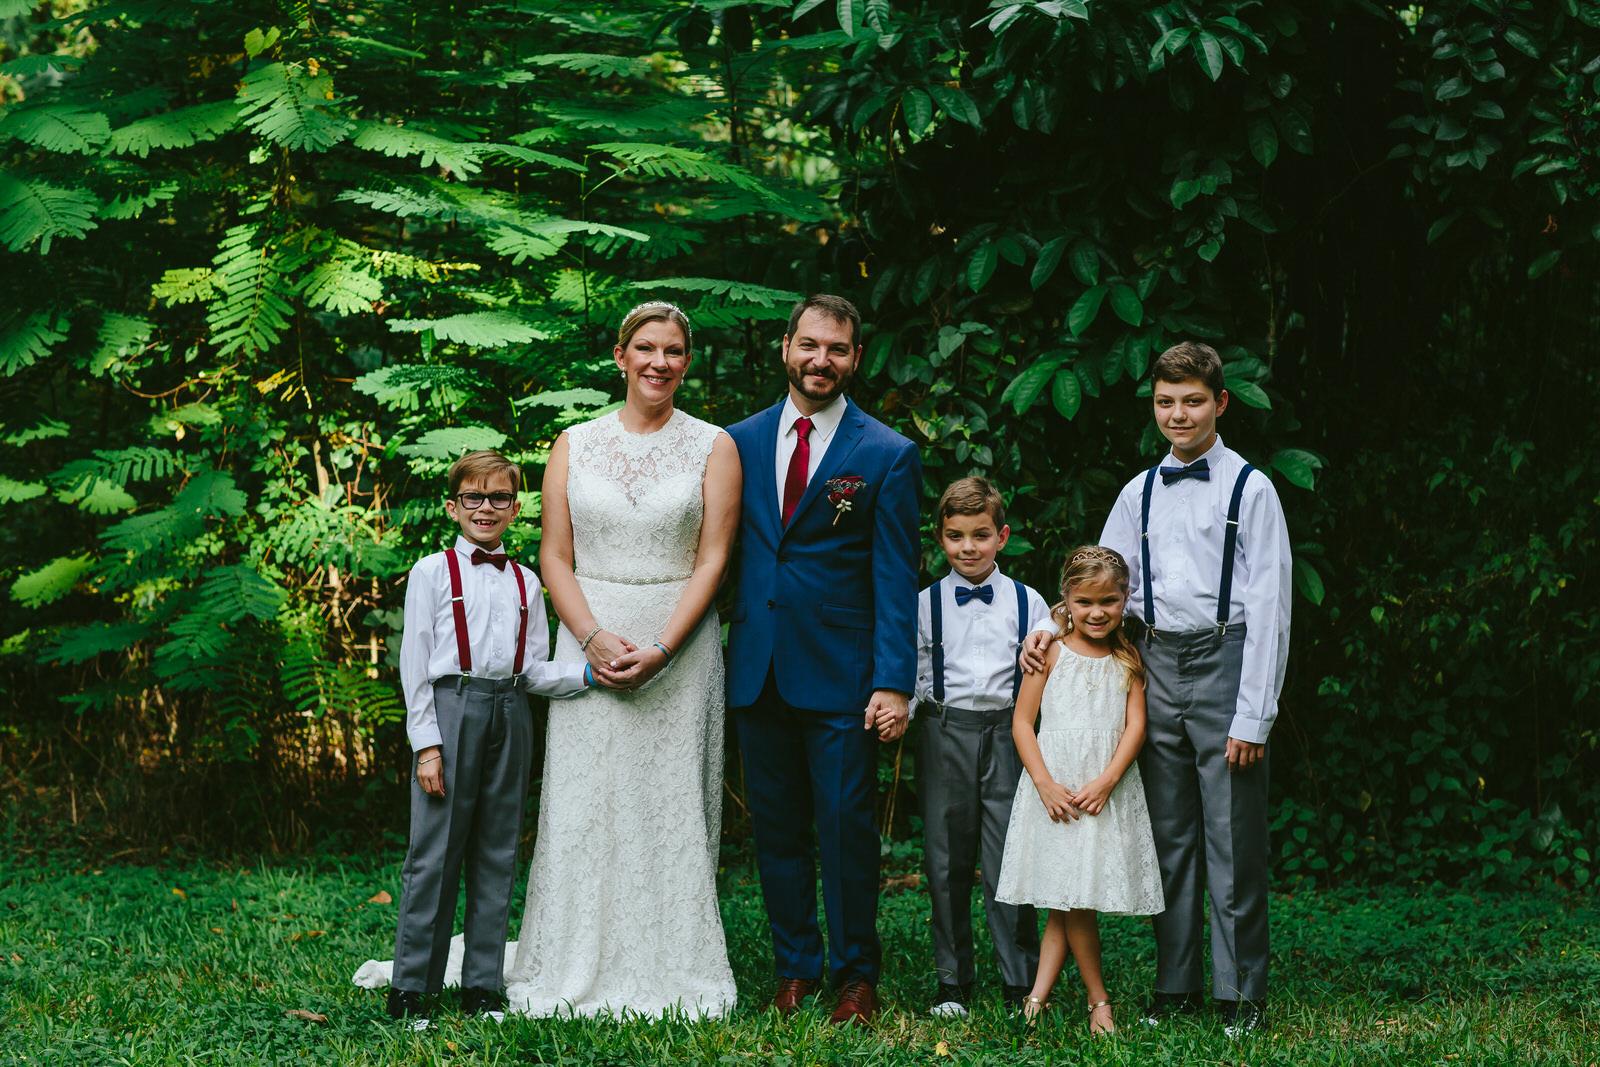 family_portraits_deering_estate_wedding_photographer_miami-10.jpg